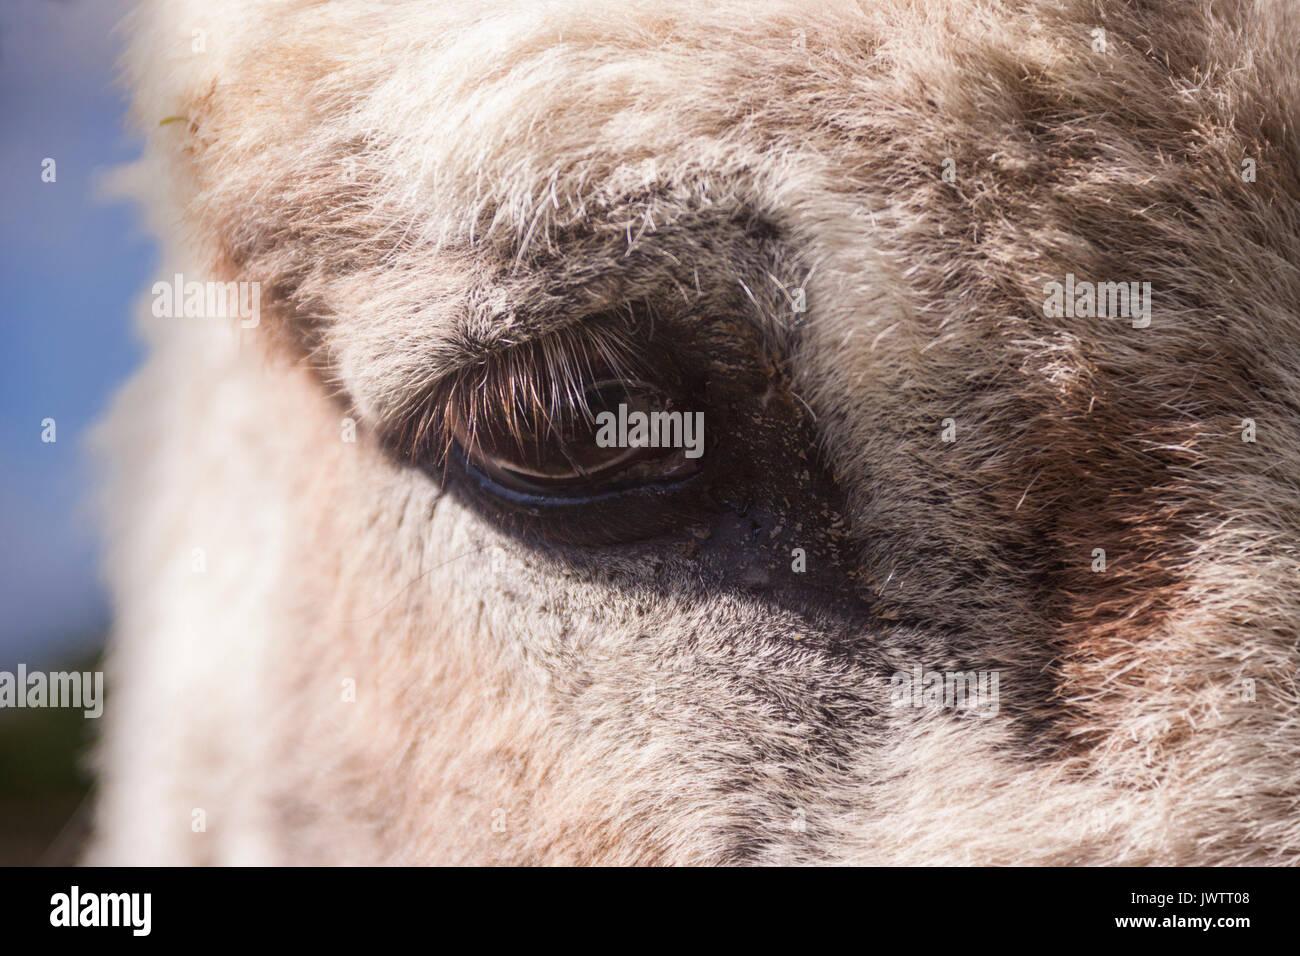 Nahaufnahme des Auges eines Esels in Sidmouth Donkey Sanctuary Stockbild